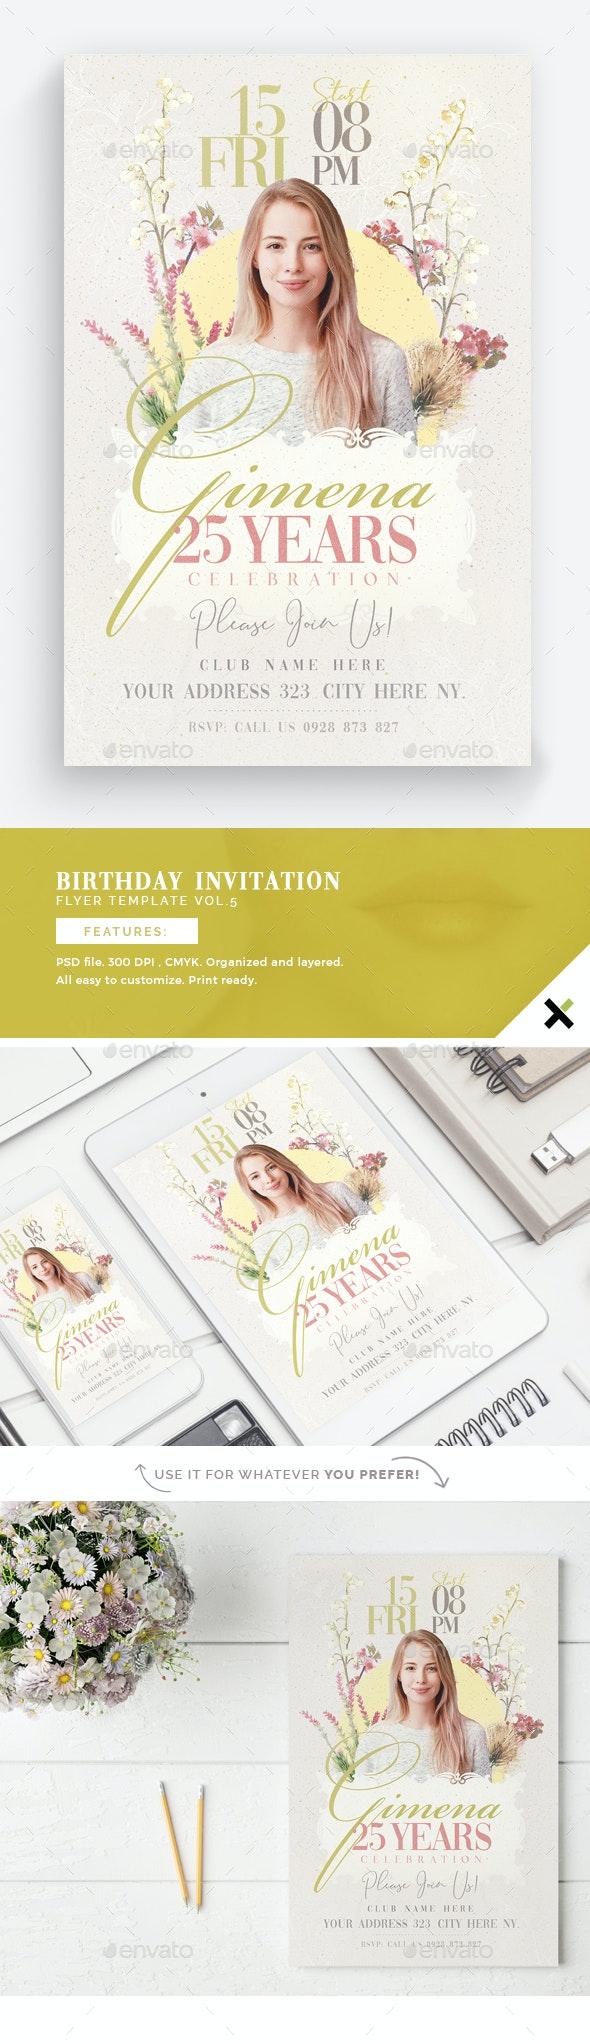 Birthday Invitation Vol.5 Flyer Template - Flyers Print Templates